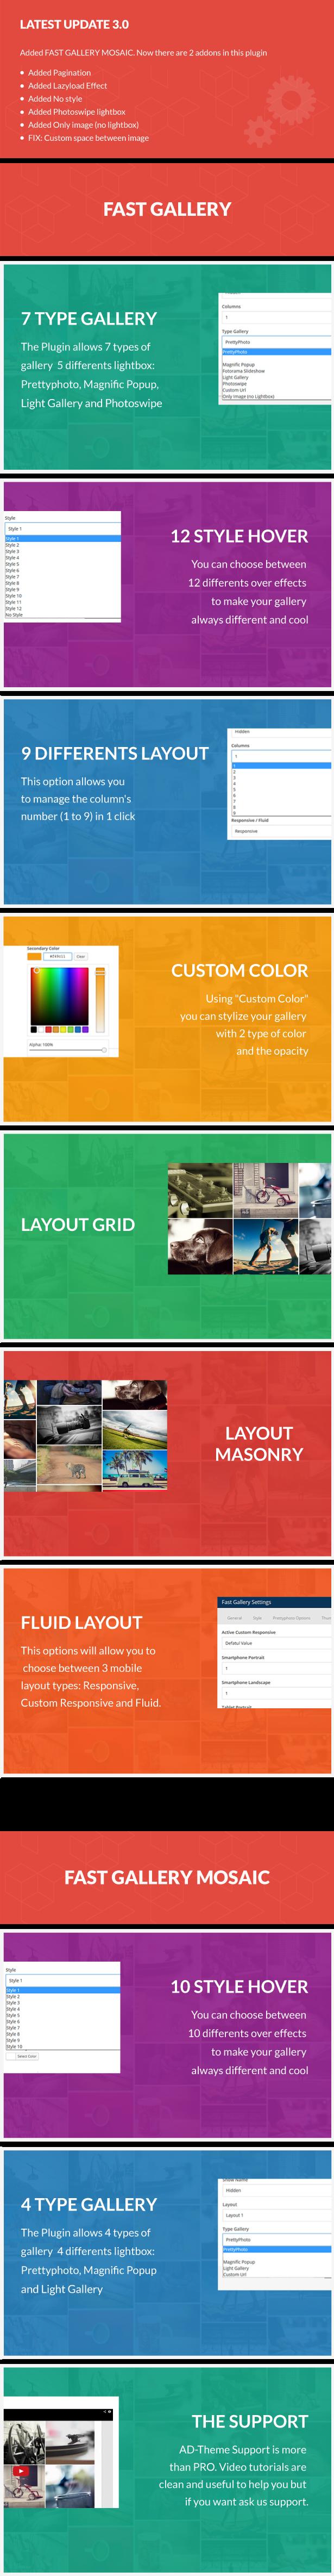 Fast Gallery for Visual Composer Wordpress Plugin - 1